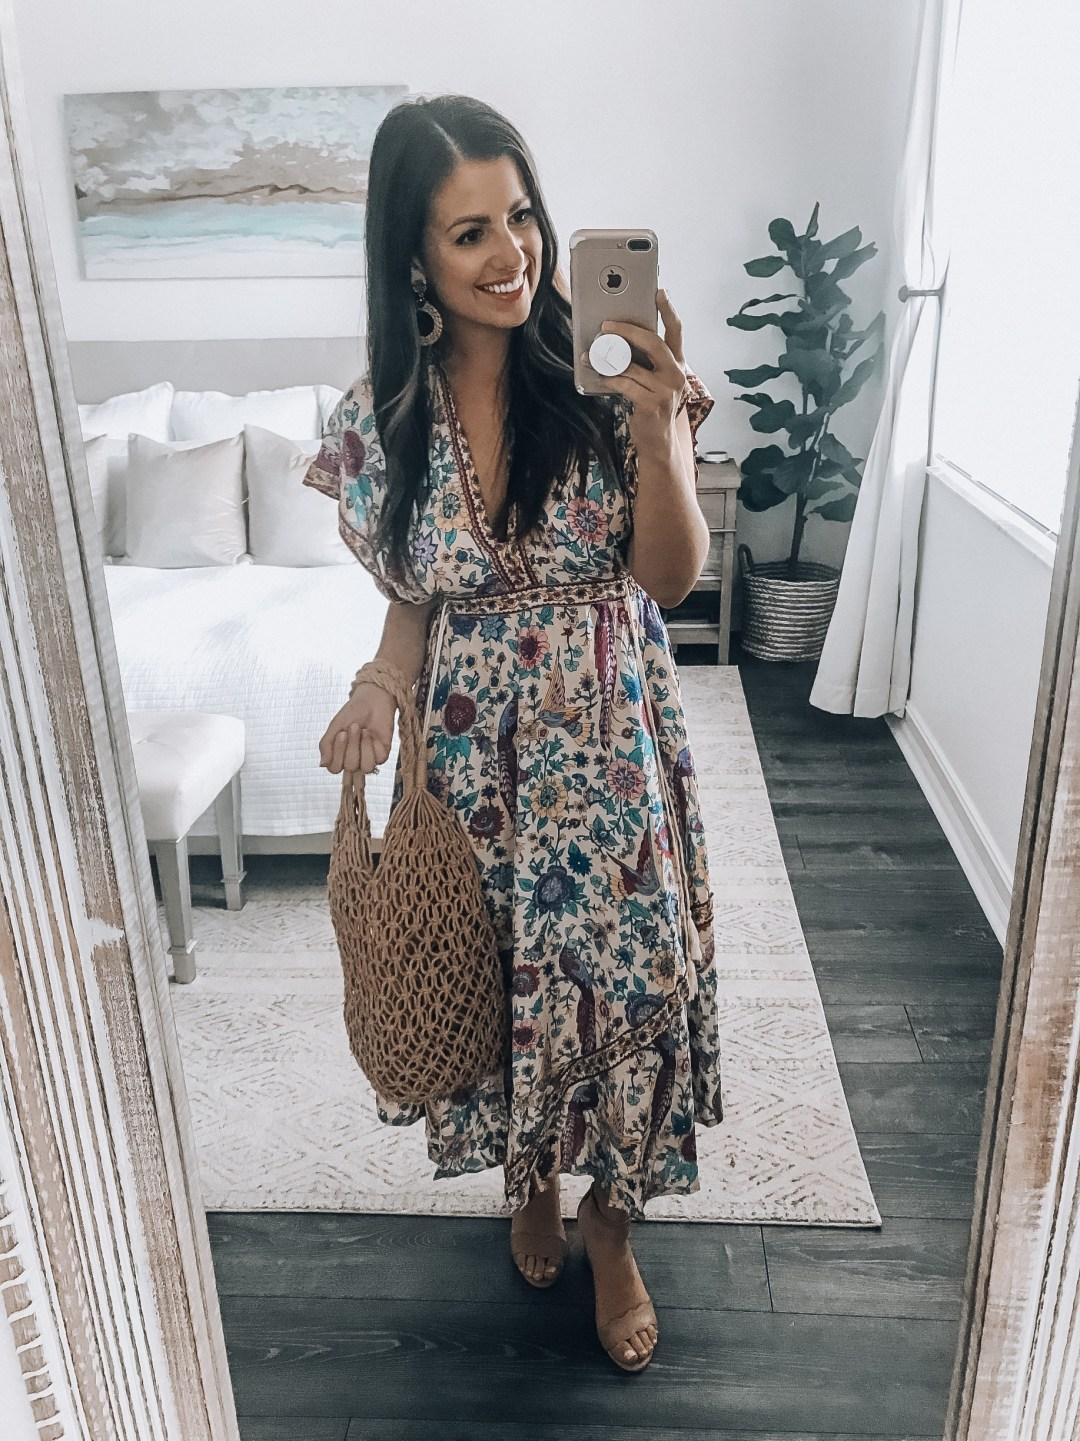 Amazon Fashion boho dress, Amazon Fashion haul